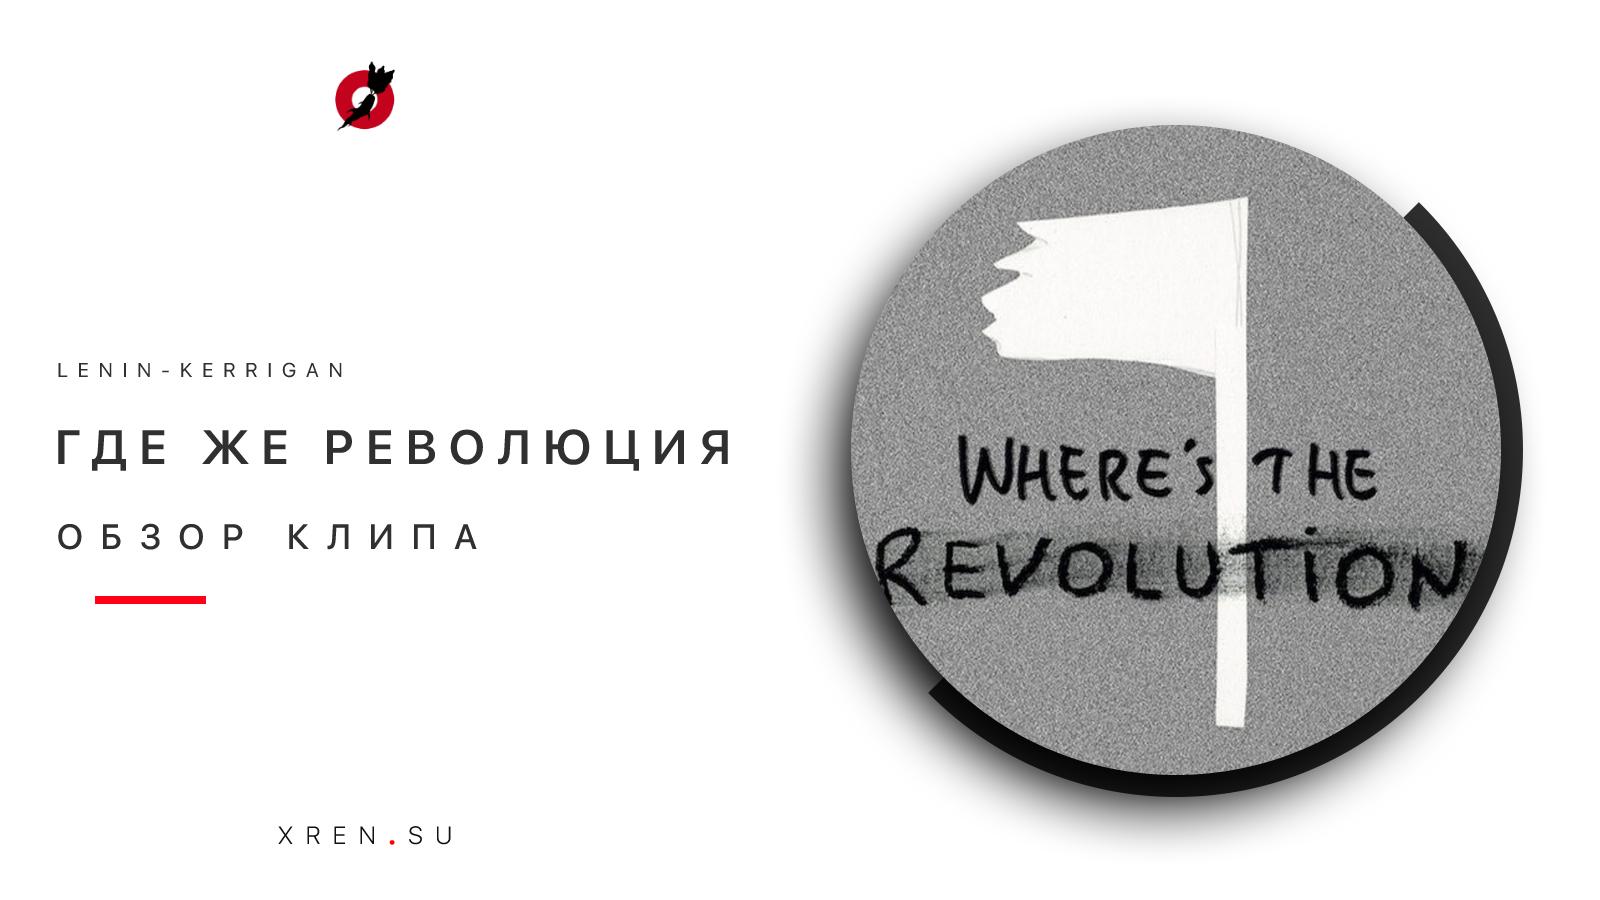 Где же Революция?